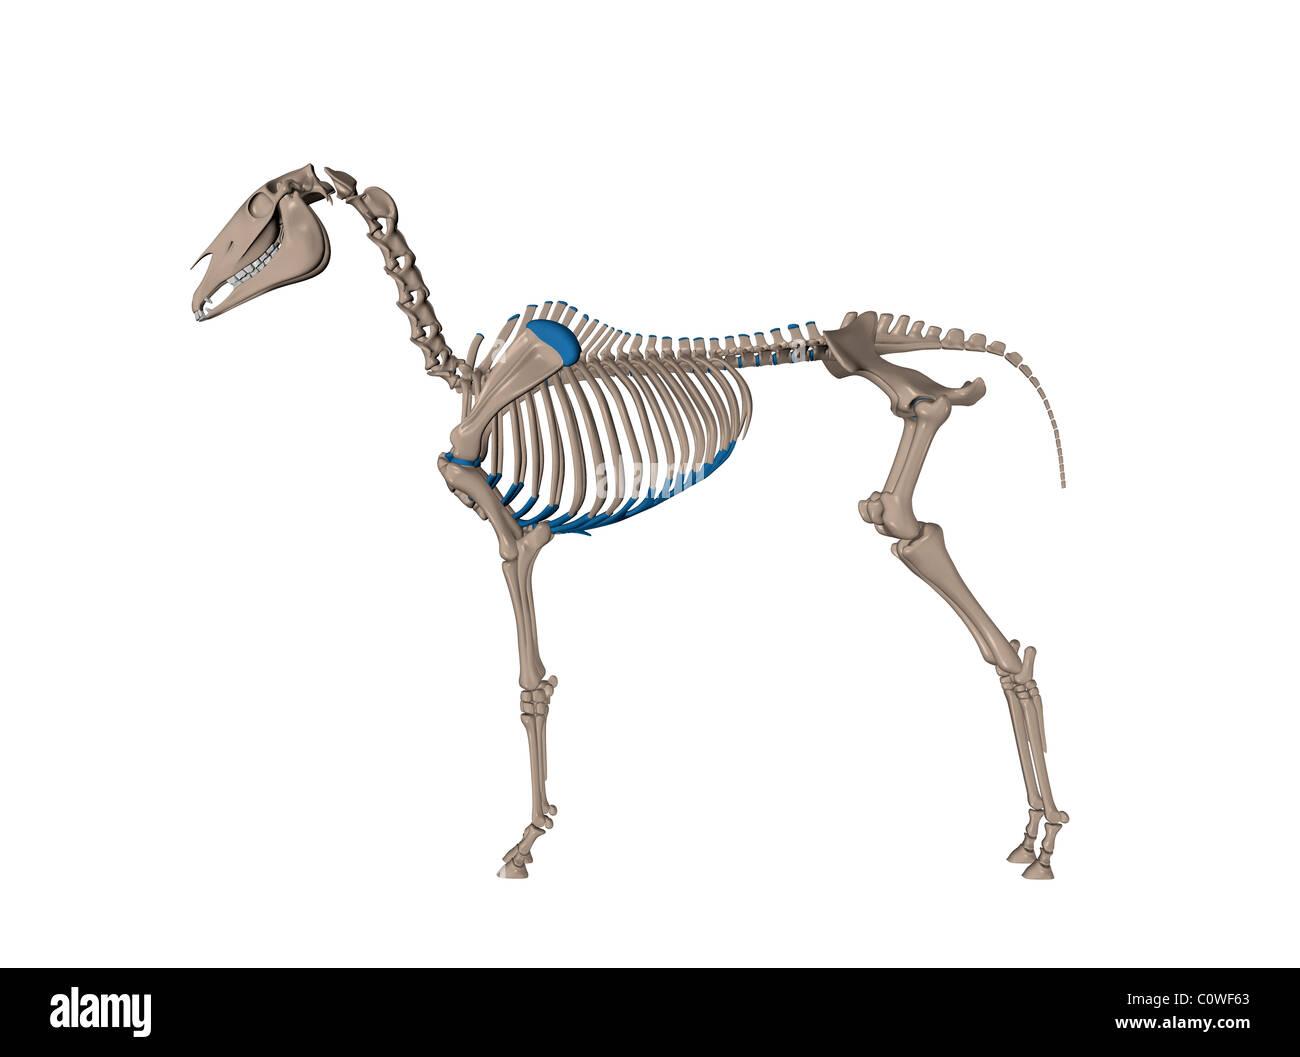 Pferd Anatomie Skelett Stockfoto, Bild: 34981467 - Alamy